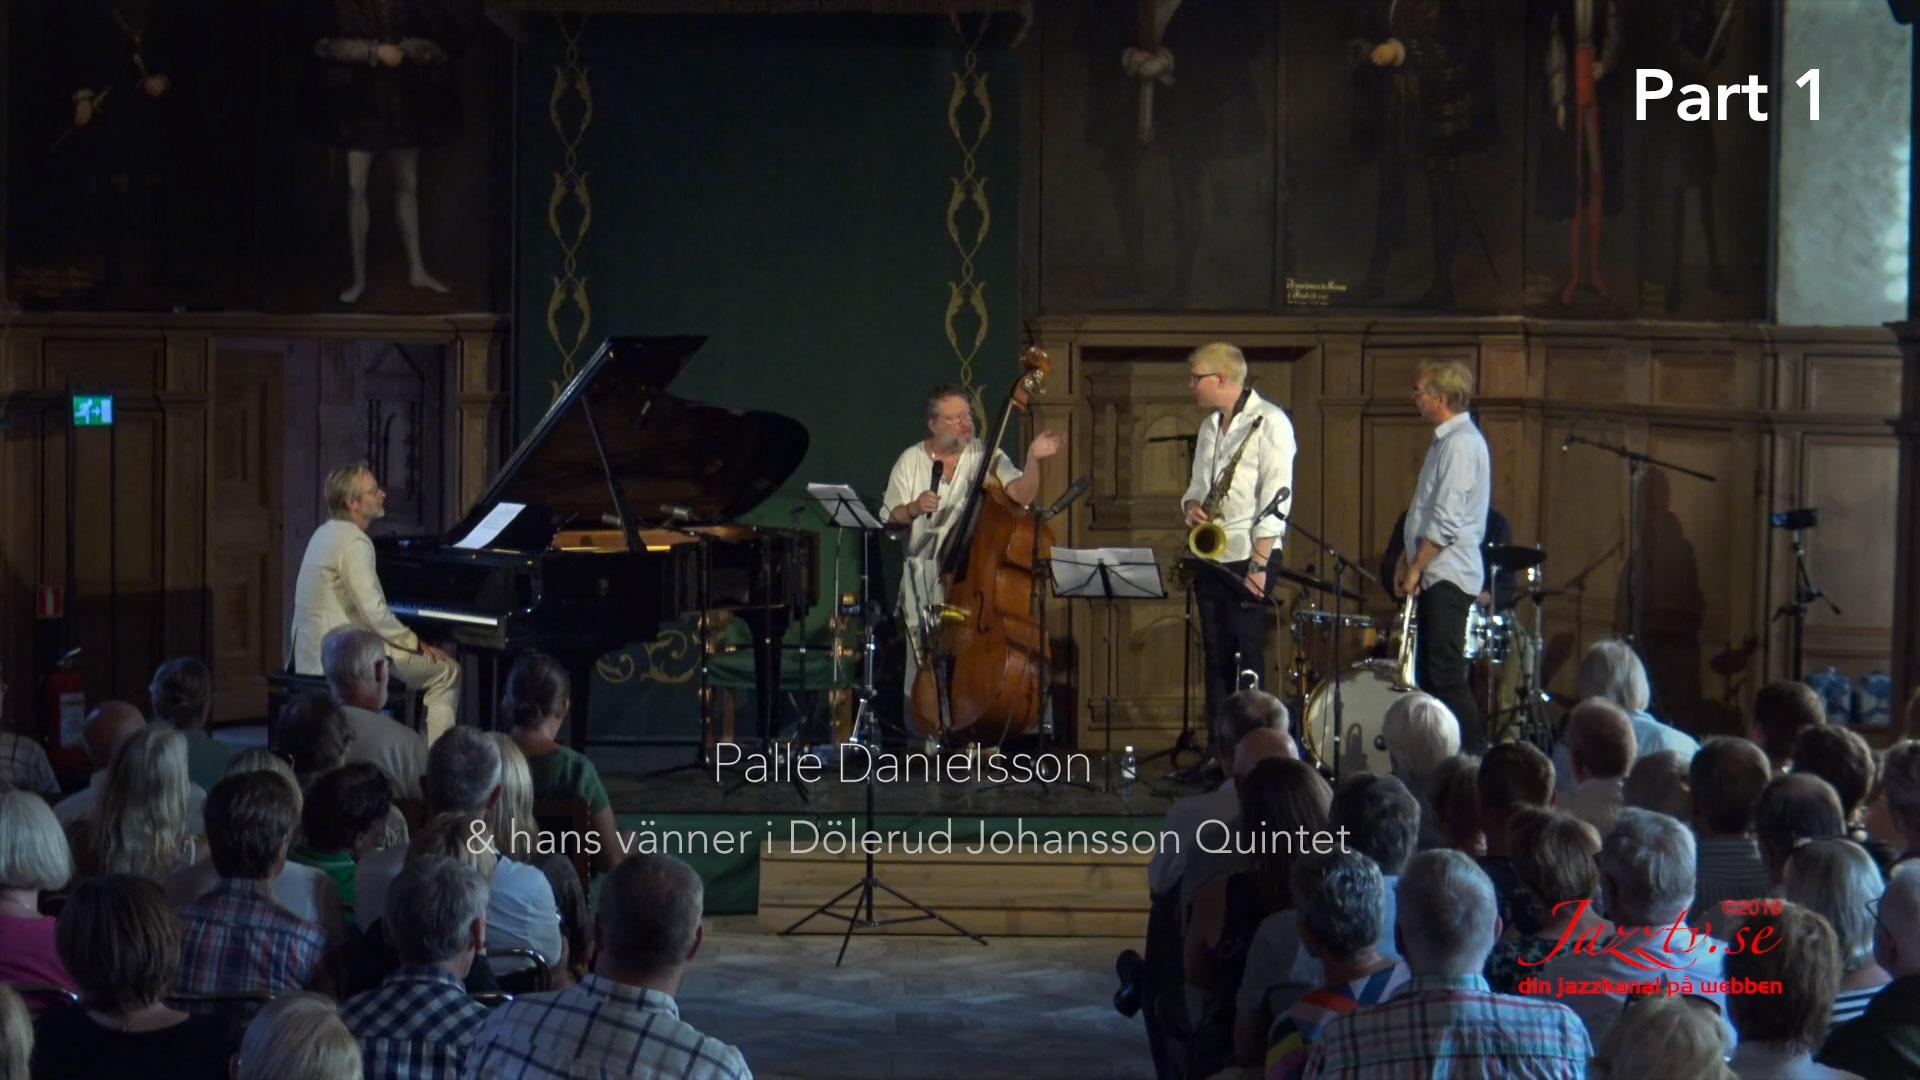 Palle and his friends in Dölerud Johansson Quintet - Part 1